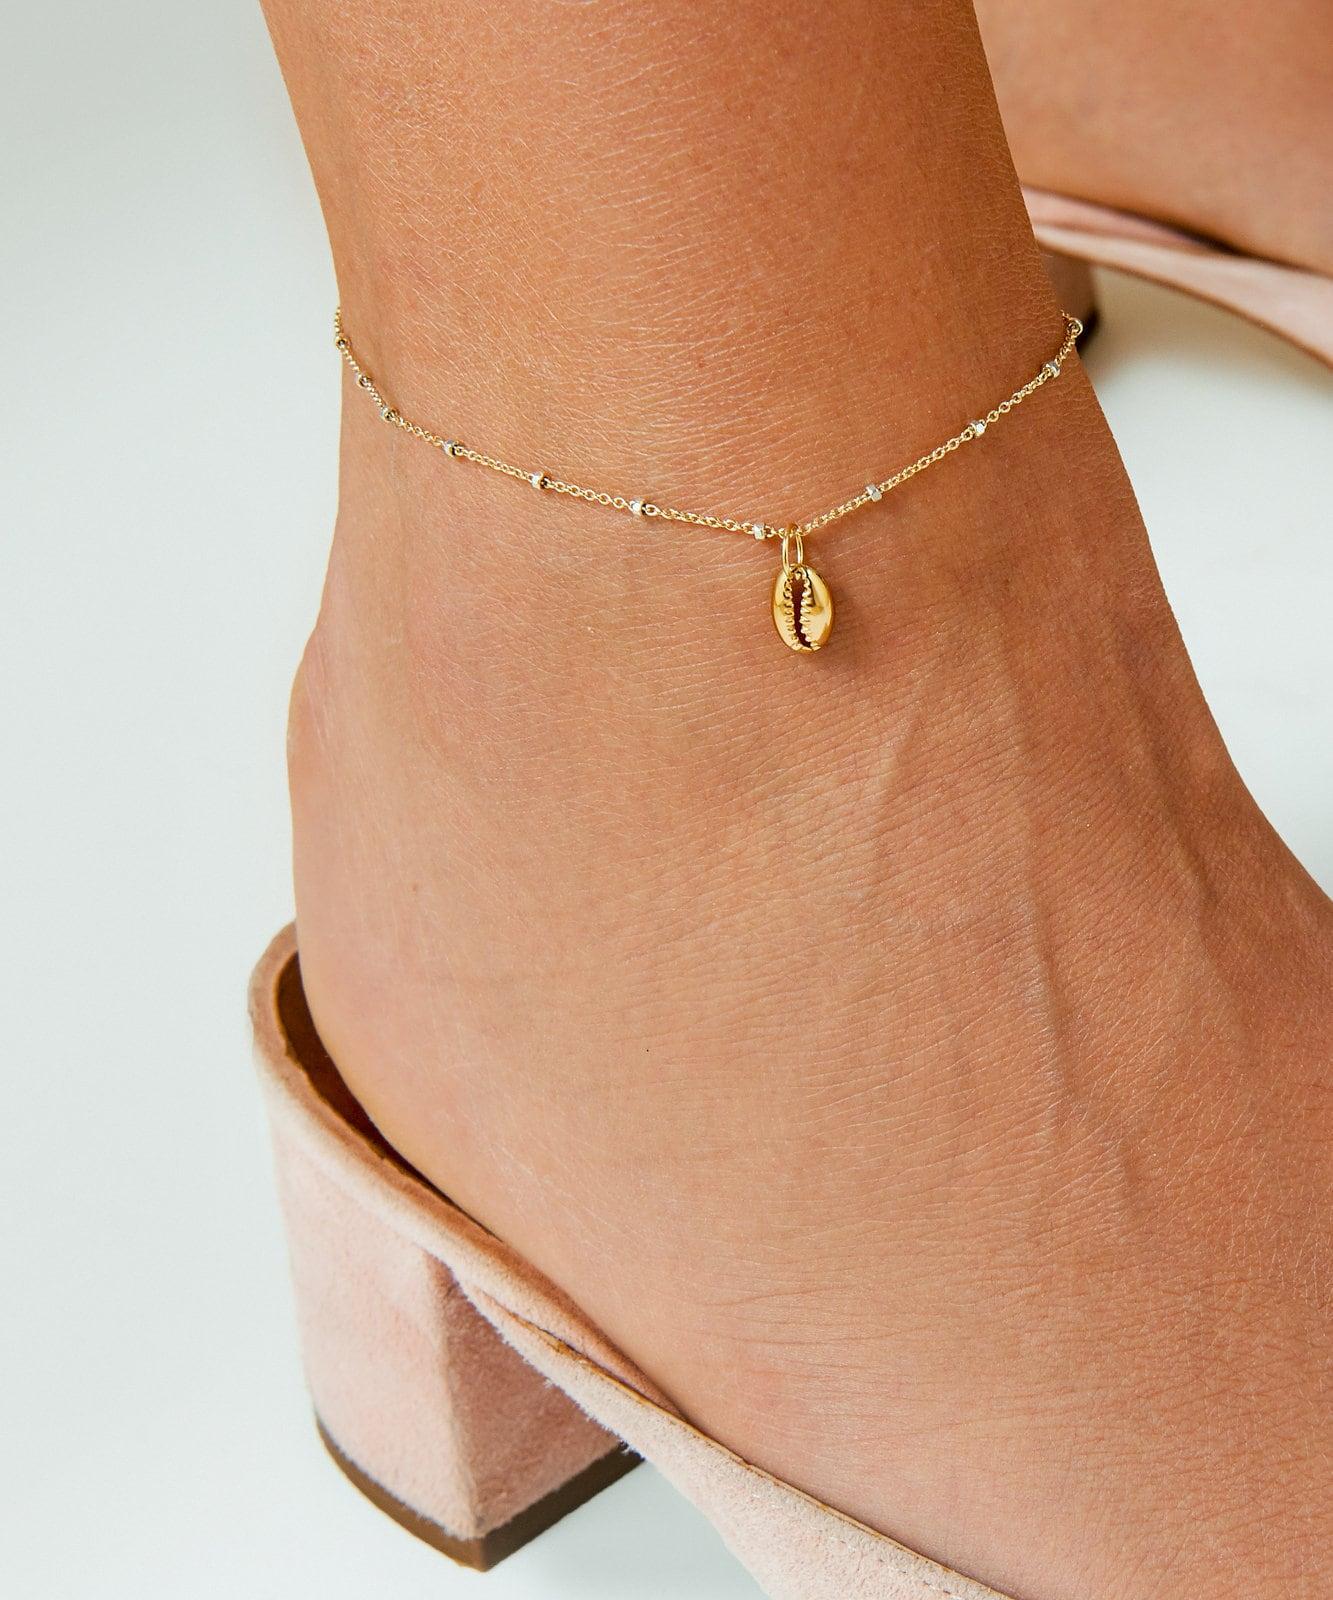 Delicate Chain Anklet • Gold Puka Shell Anklet • Puka Anklet Chain •  Seashell Anklet • Anklet Bracelet • Anklet Bead Bracelet